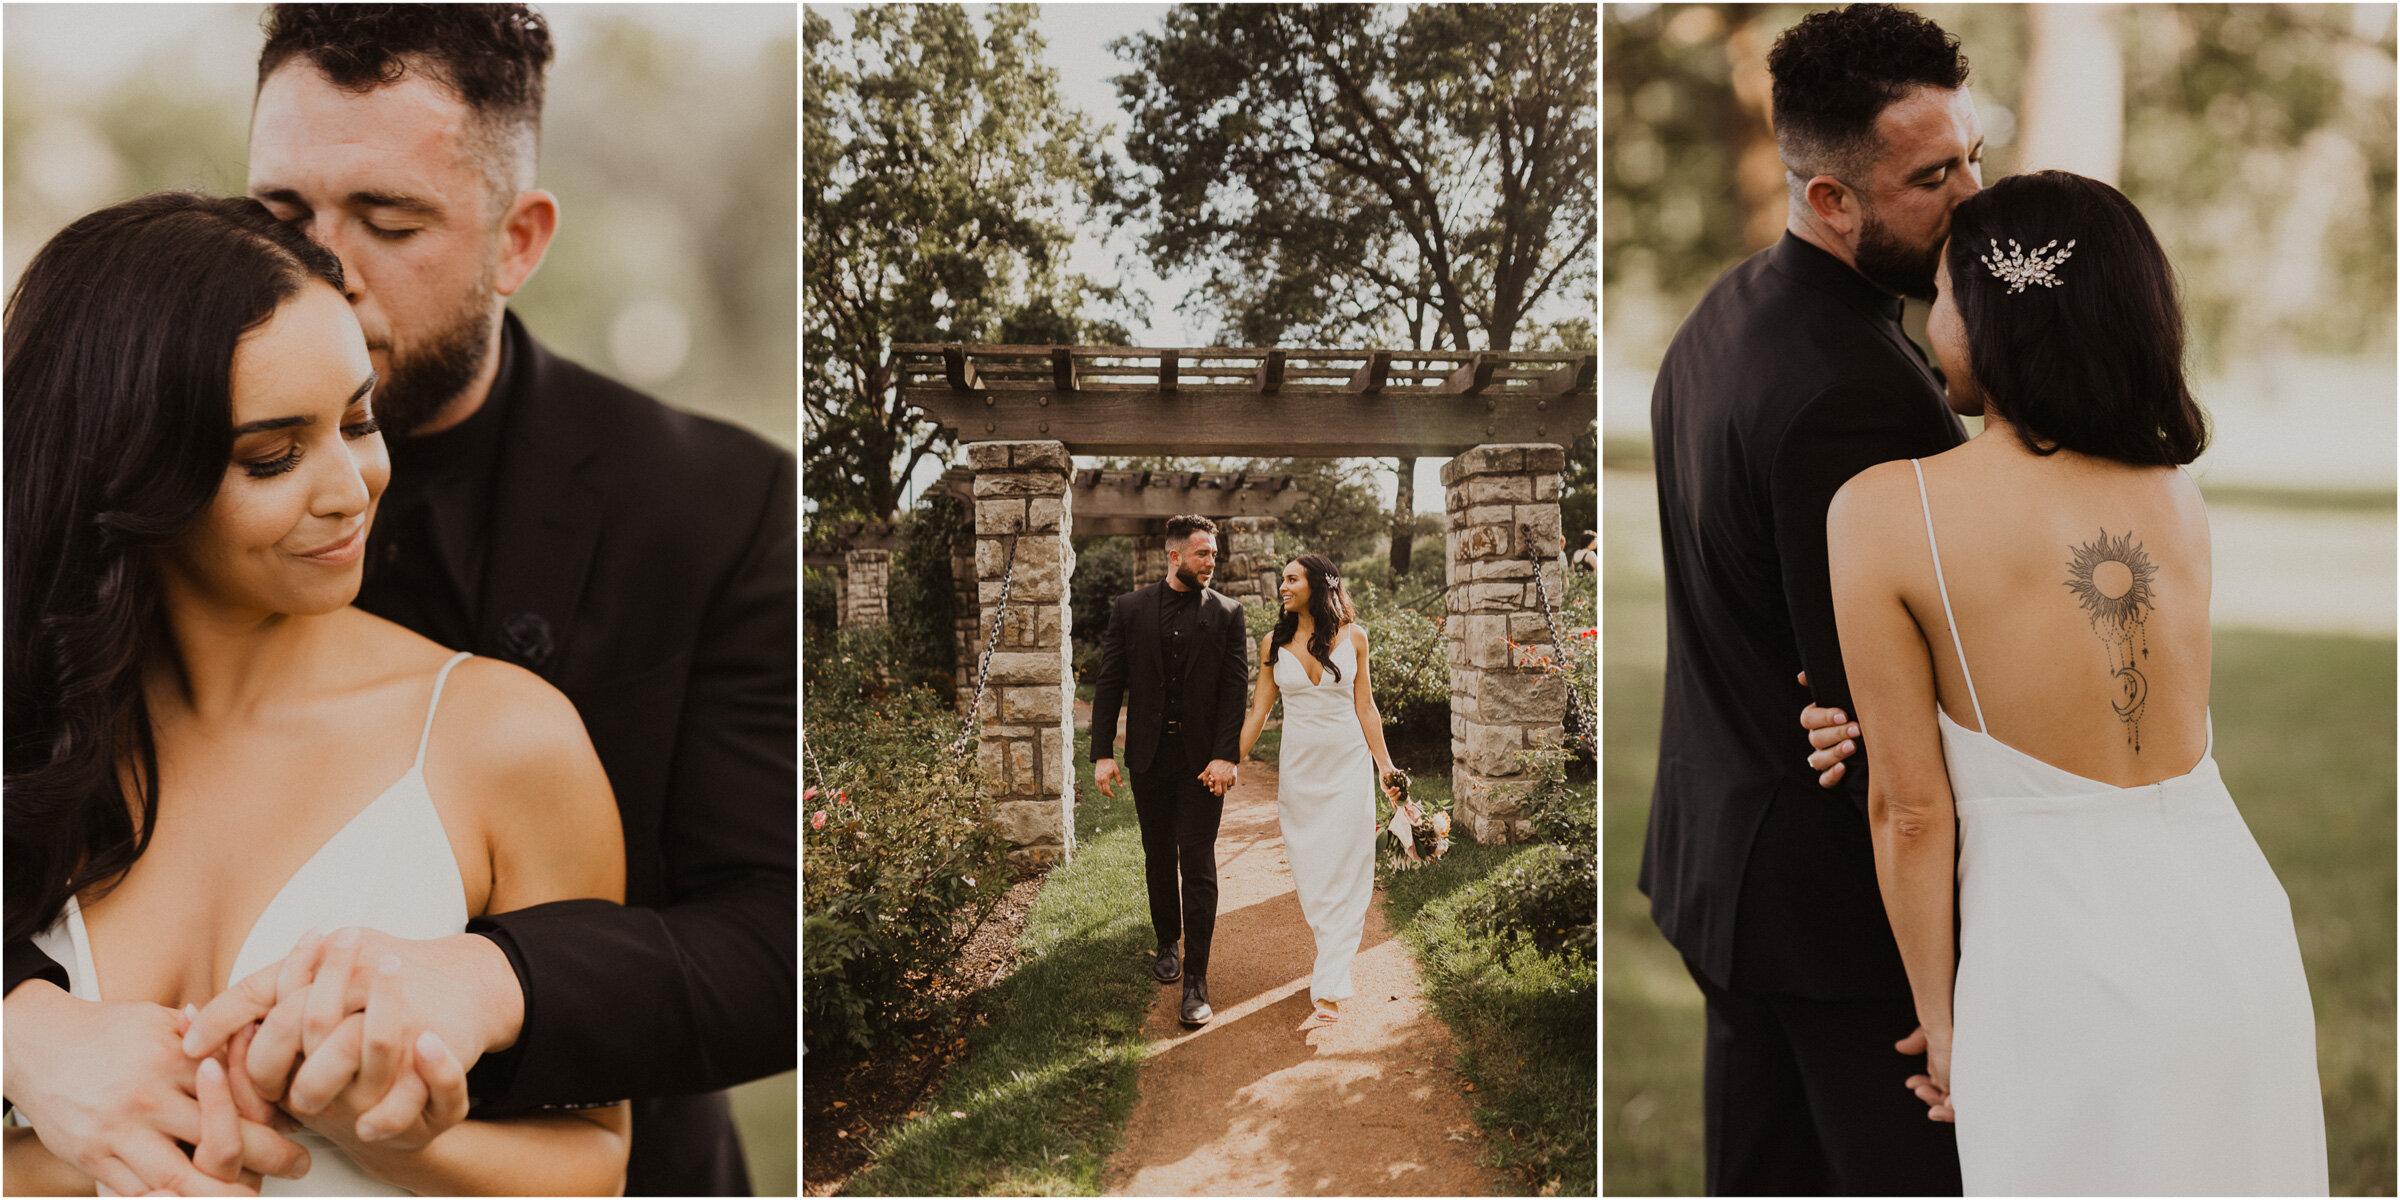 alyssa barletter photography la villa kansas city patio wedding sarah seven wedding dress-30.jpg